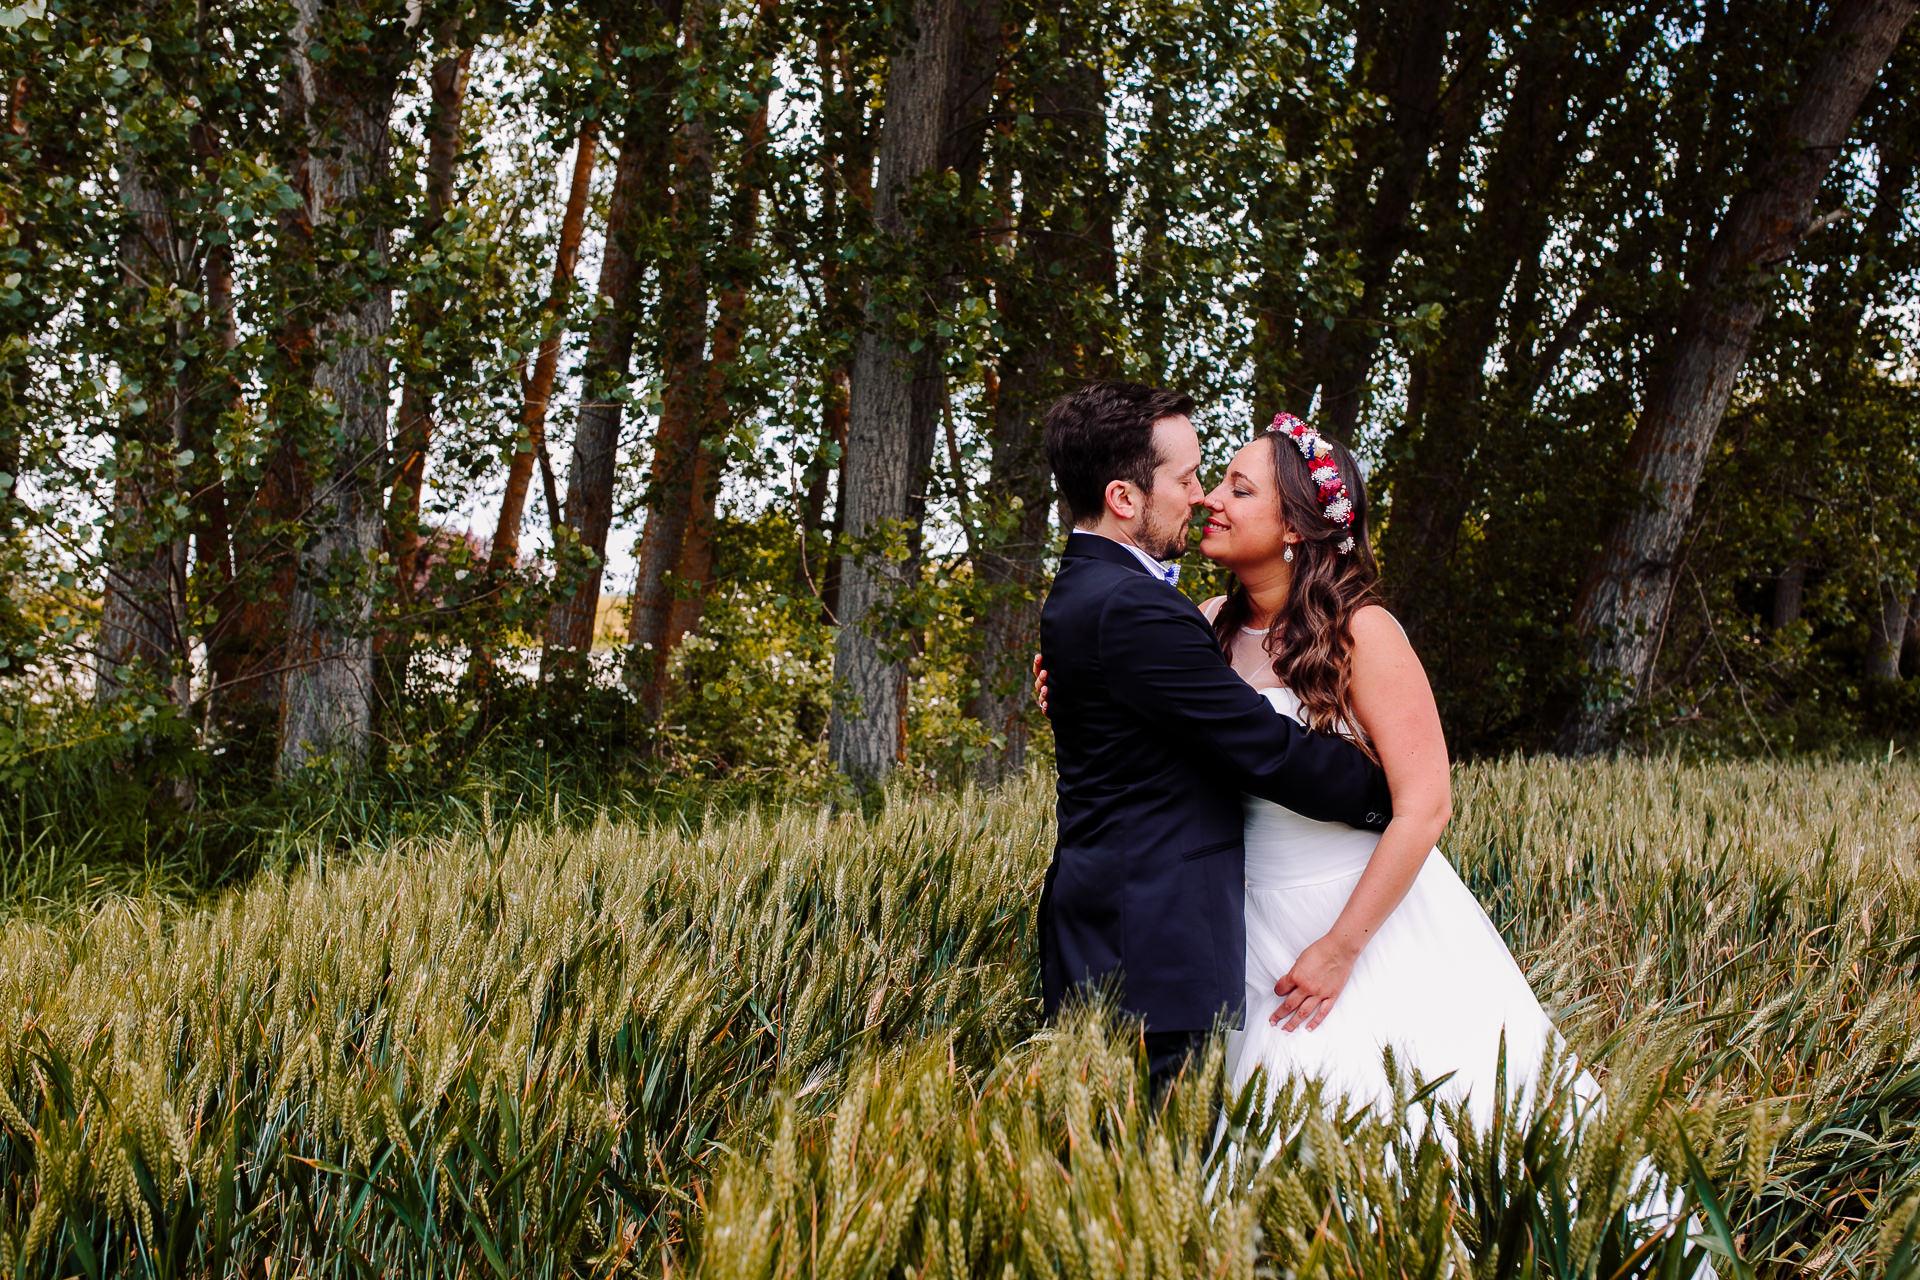 boda civil restaurante lola 140516